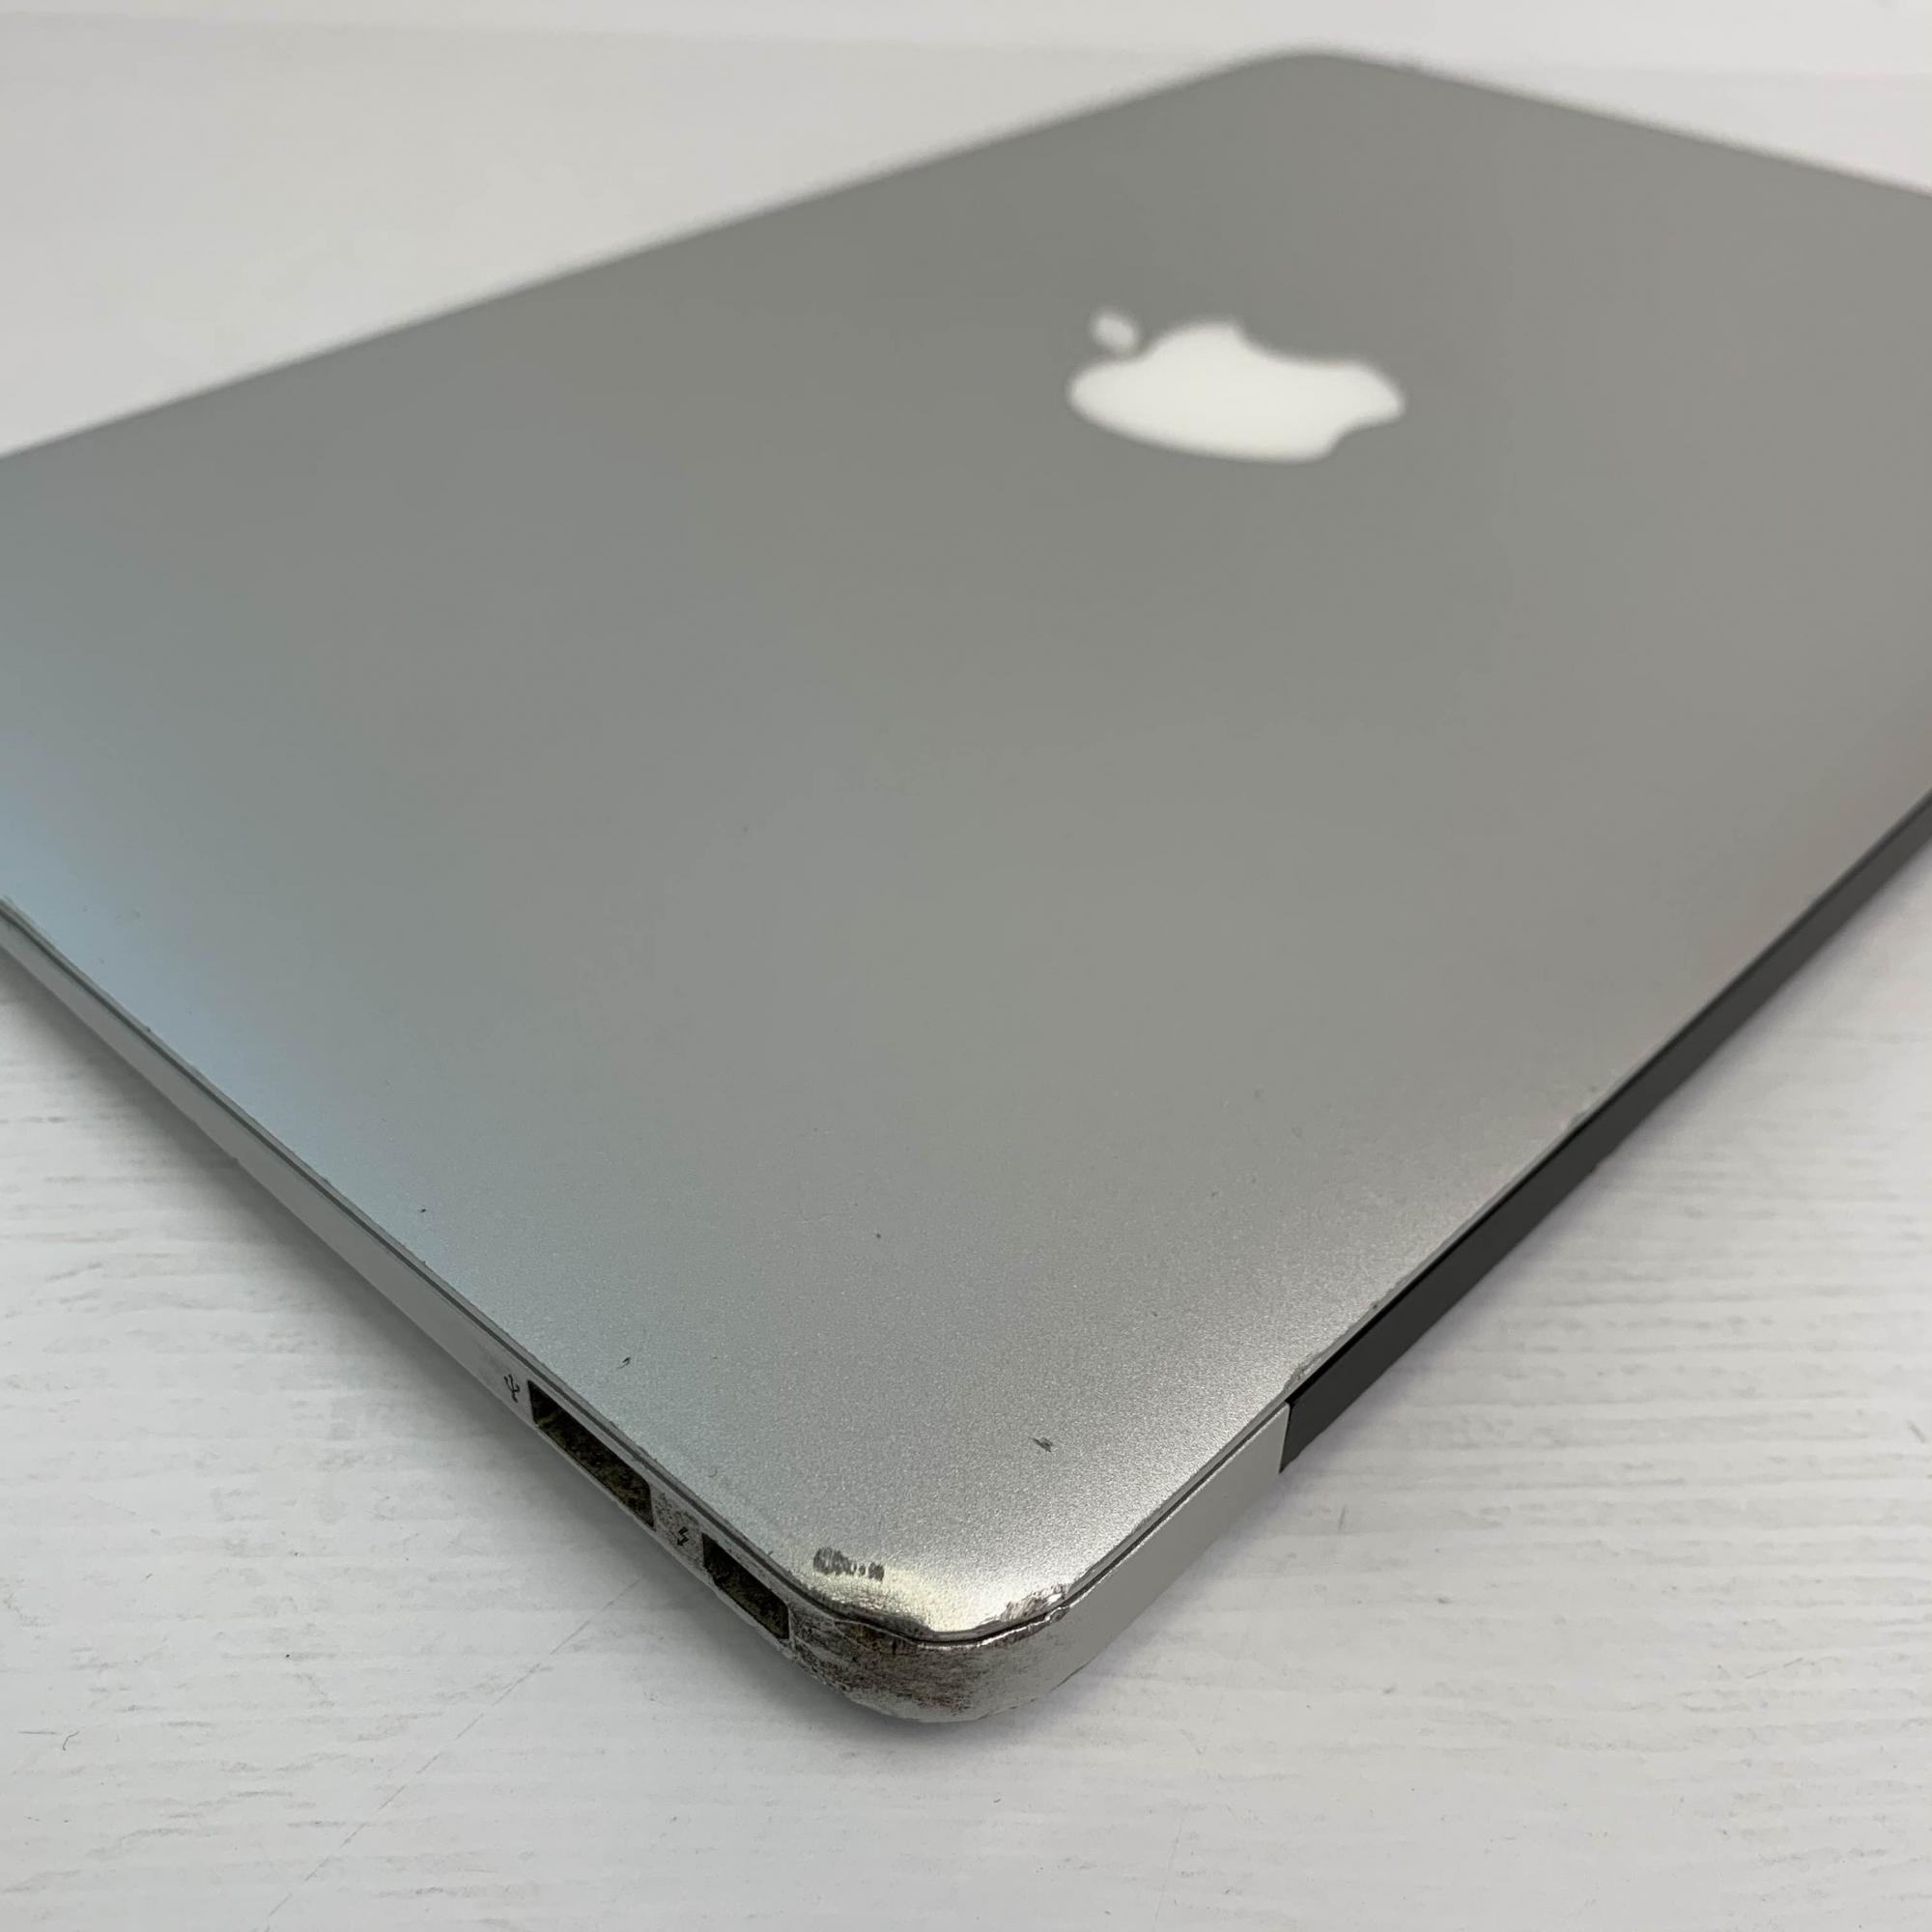 Macbook Air 11 i5 1.6Ghz 4GB 256GB SSD MJVM2LL/A Seminovo